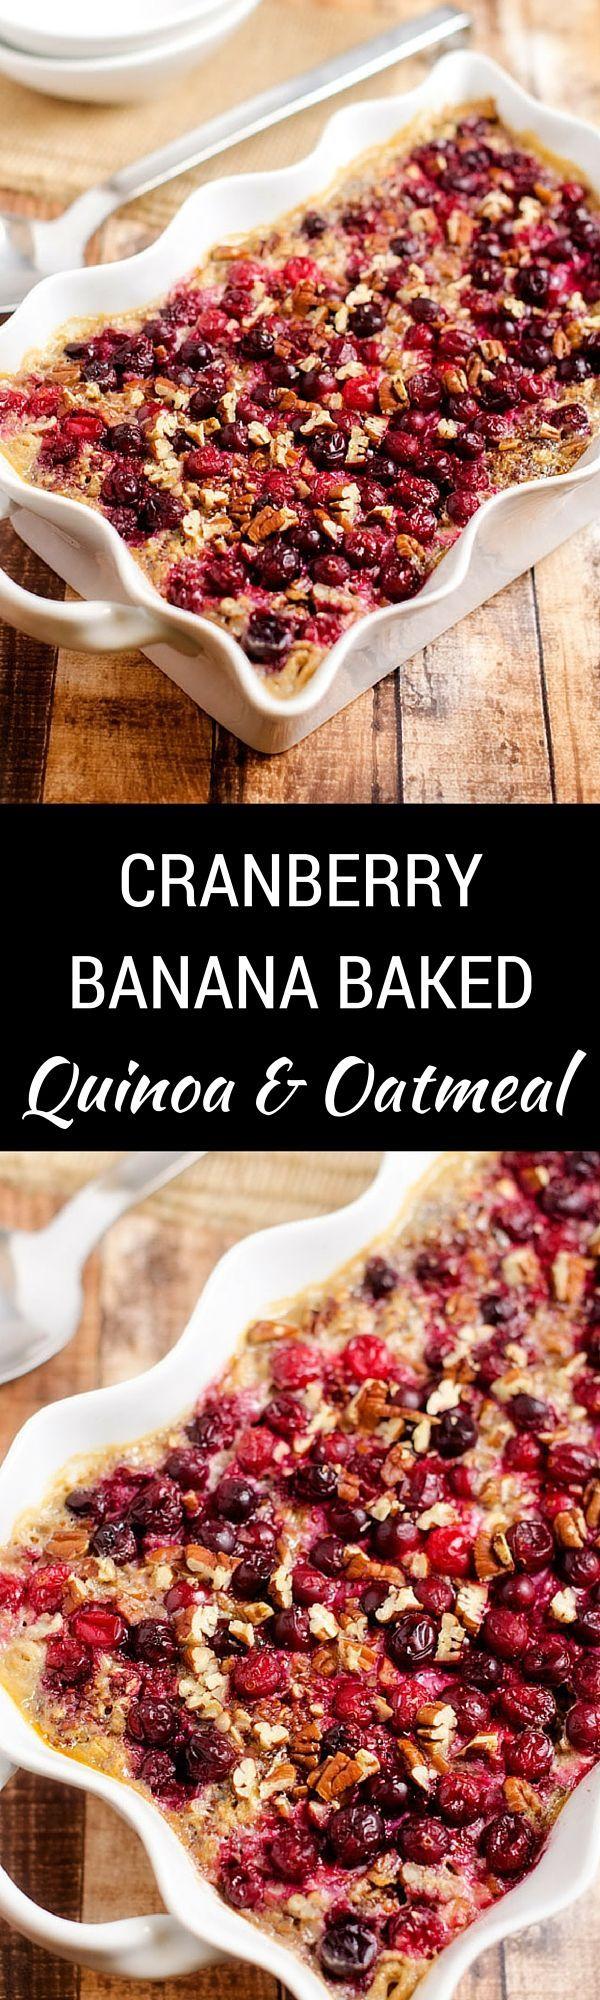 Cranberry Banana Baked Quinoa & Oatmeal